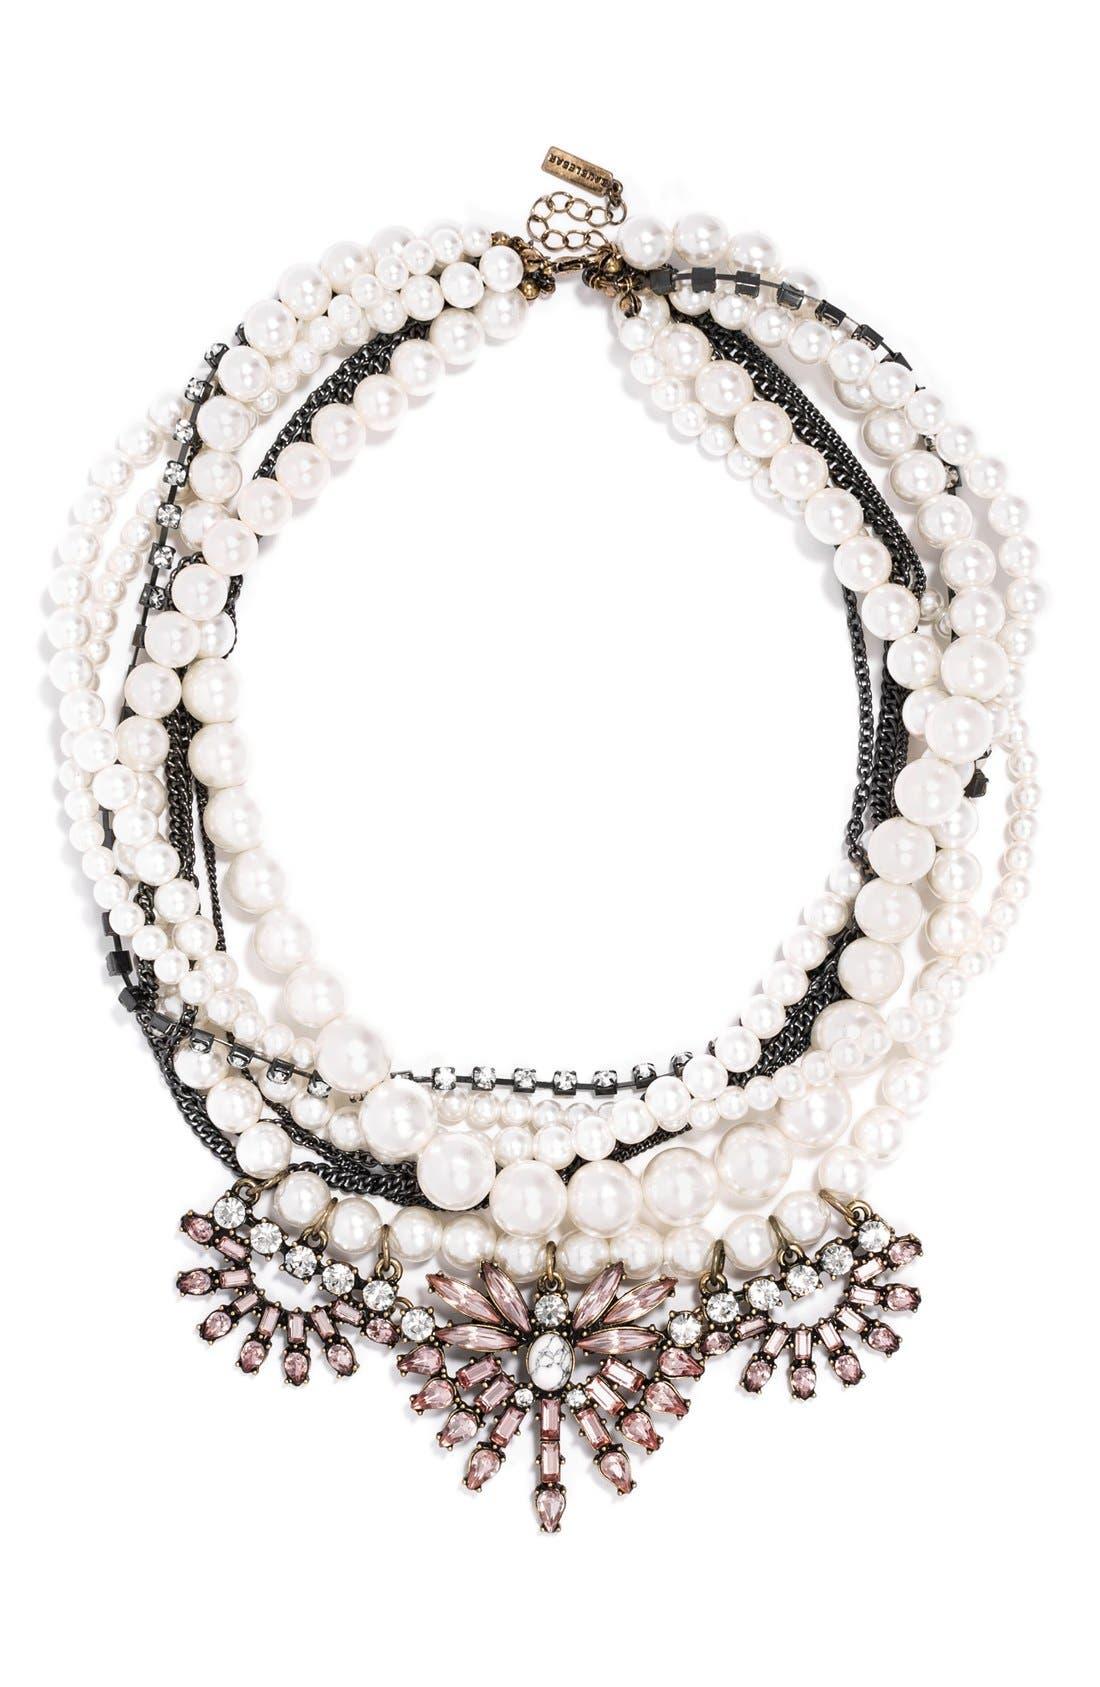 Main Image - BaubleBar 'Bennett' Layered Bib Necklace